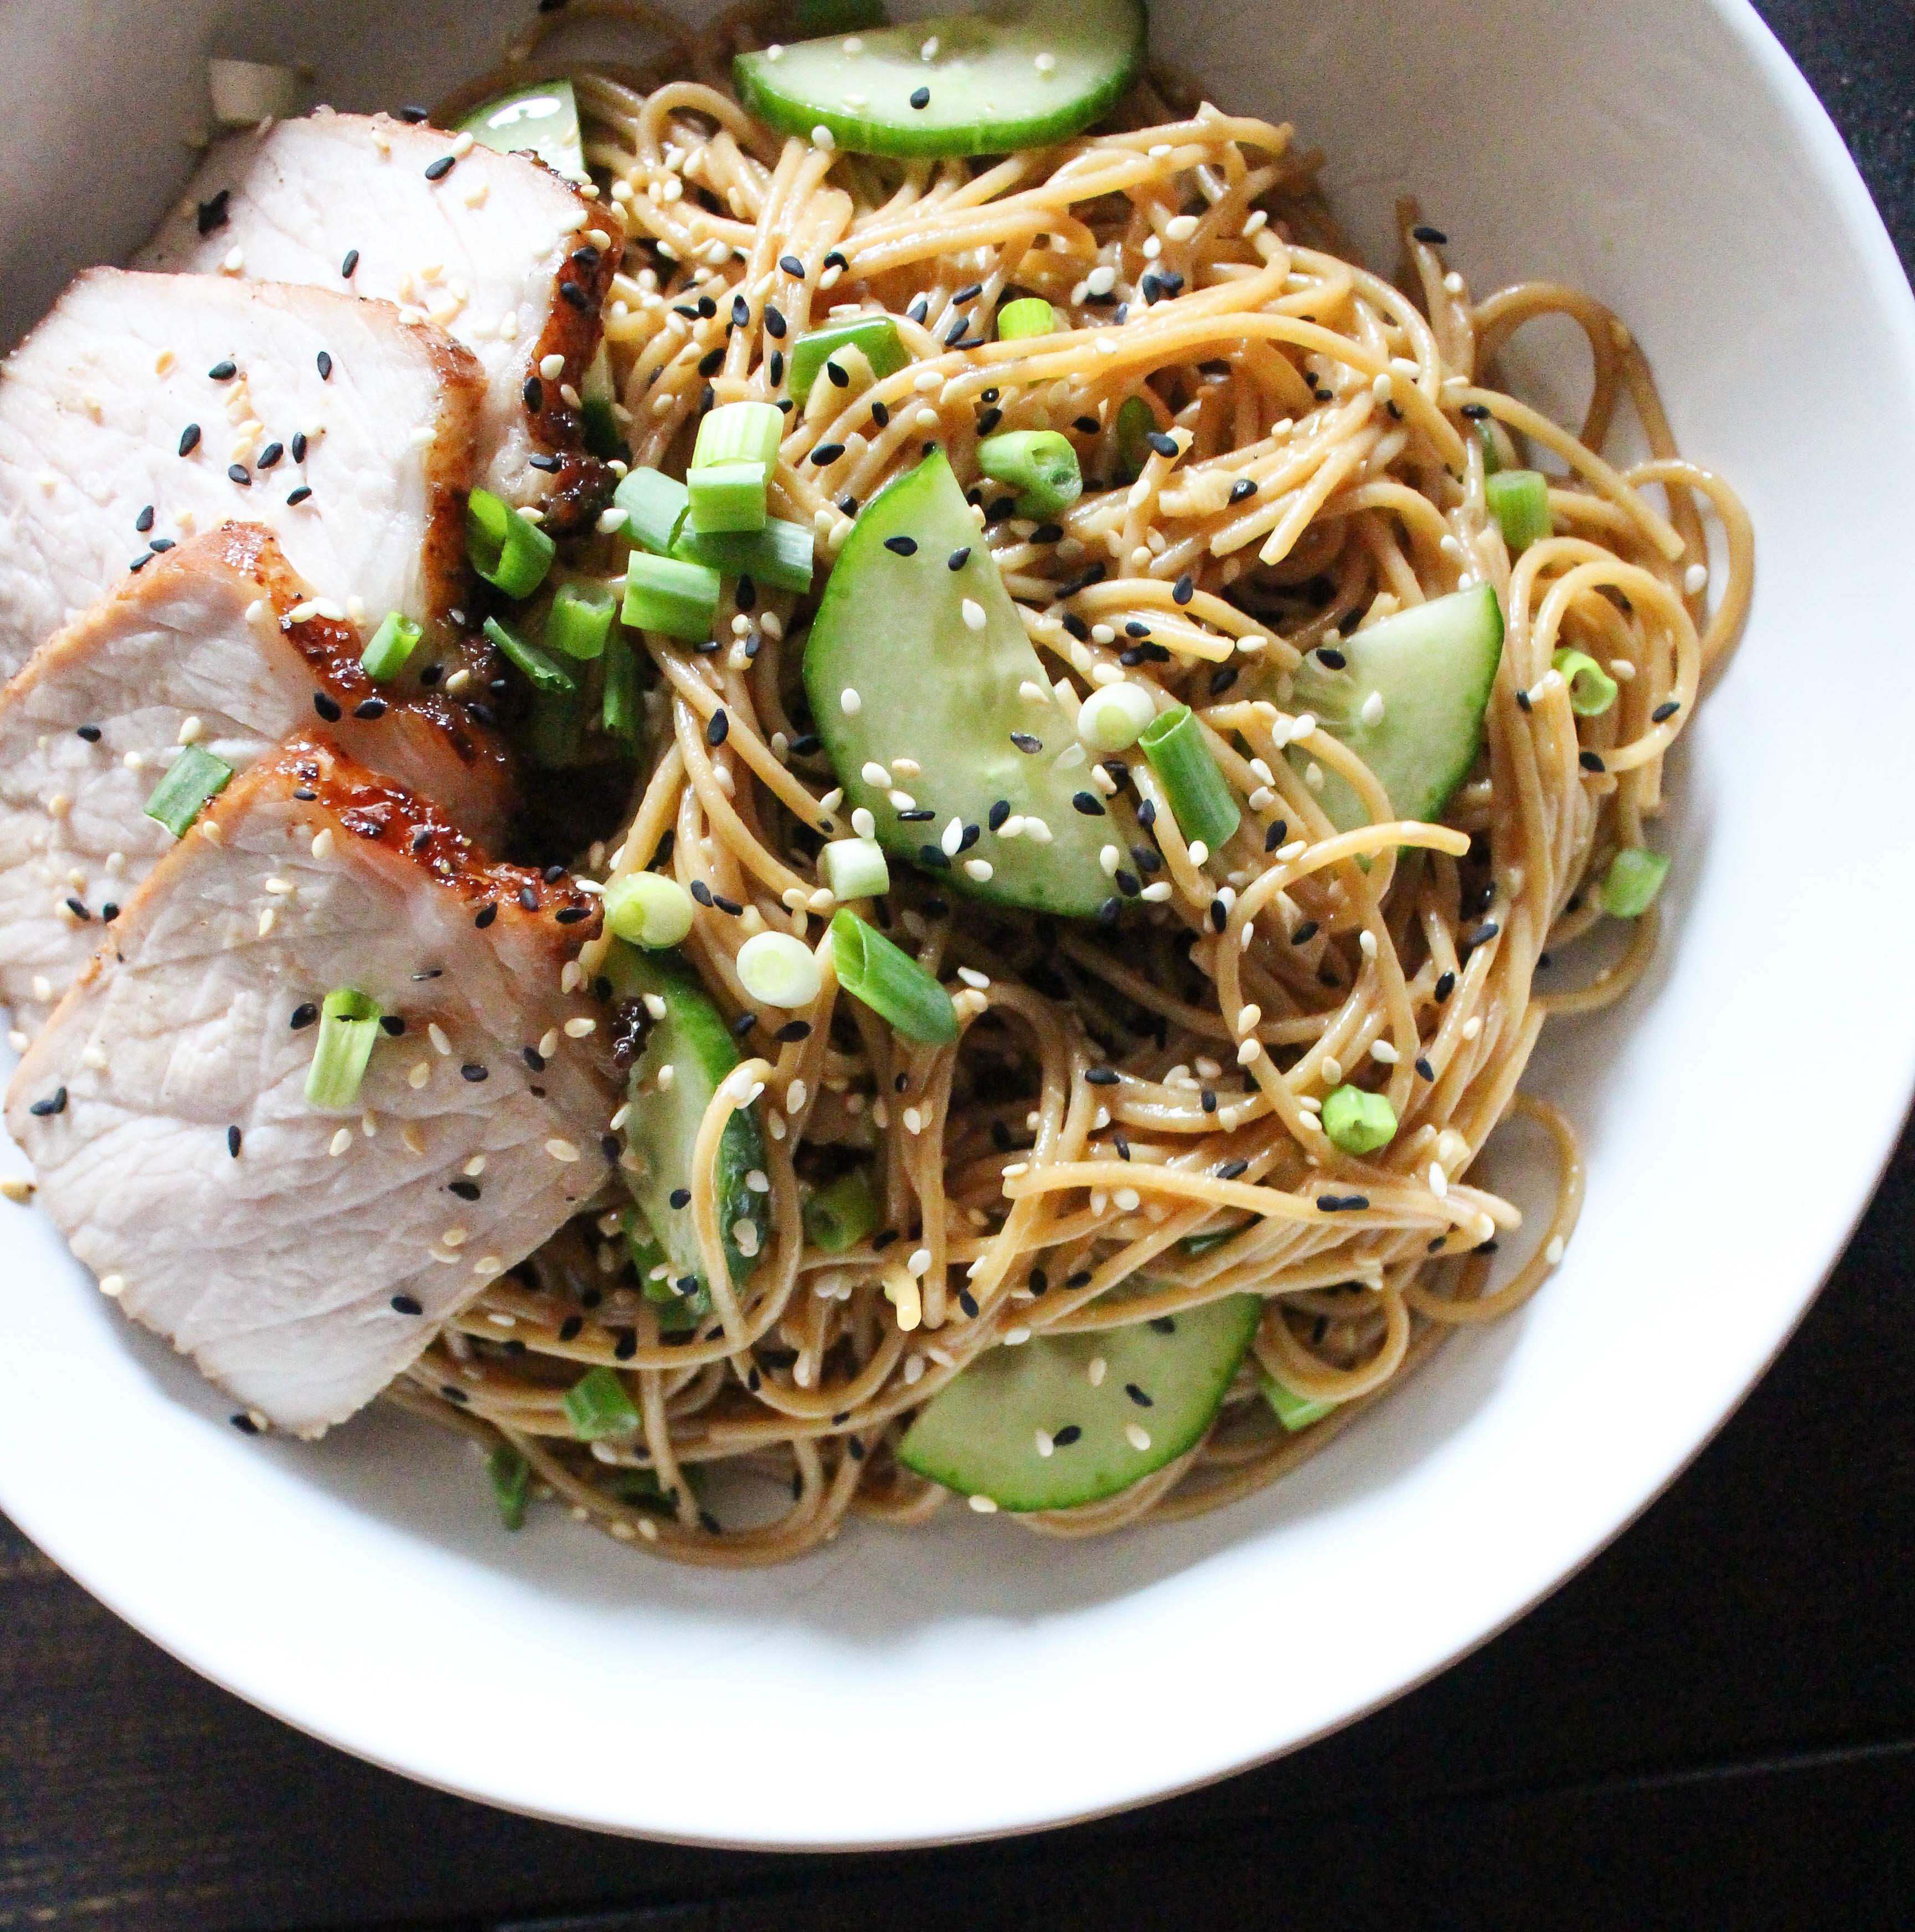 Warm Wasabi Noodles with Asian Marinated Pork Loin